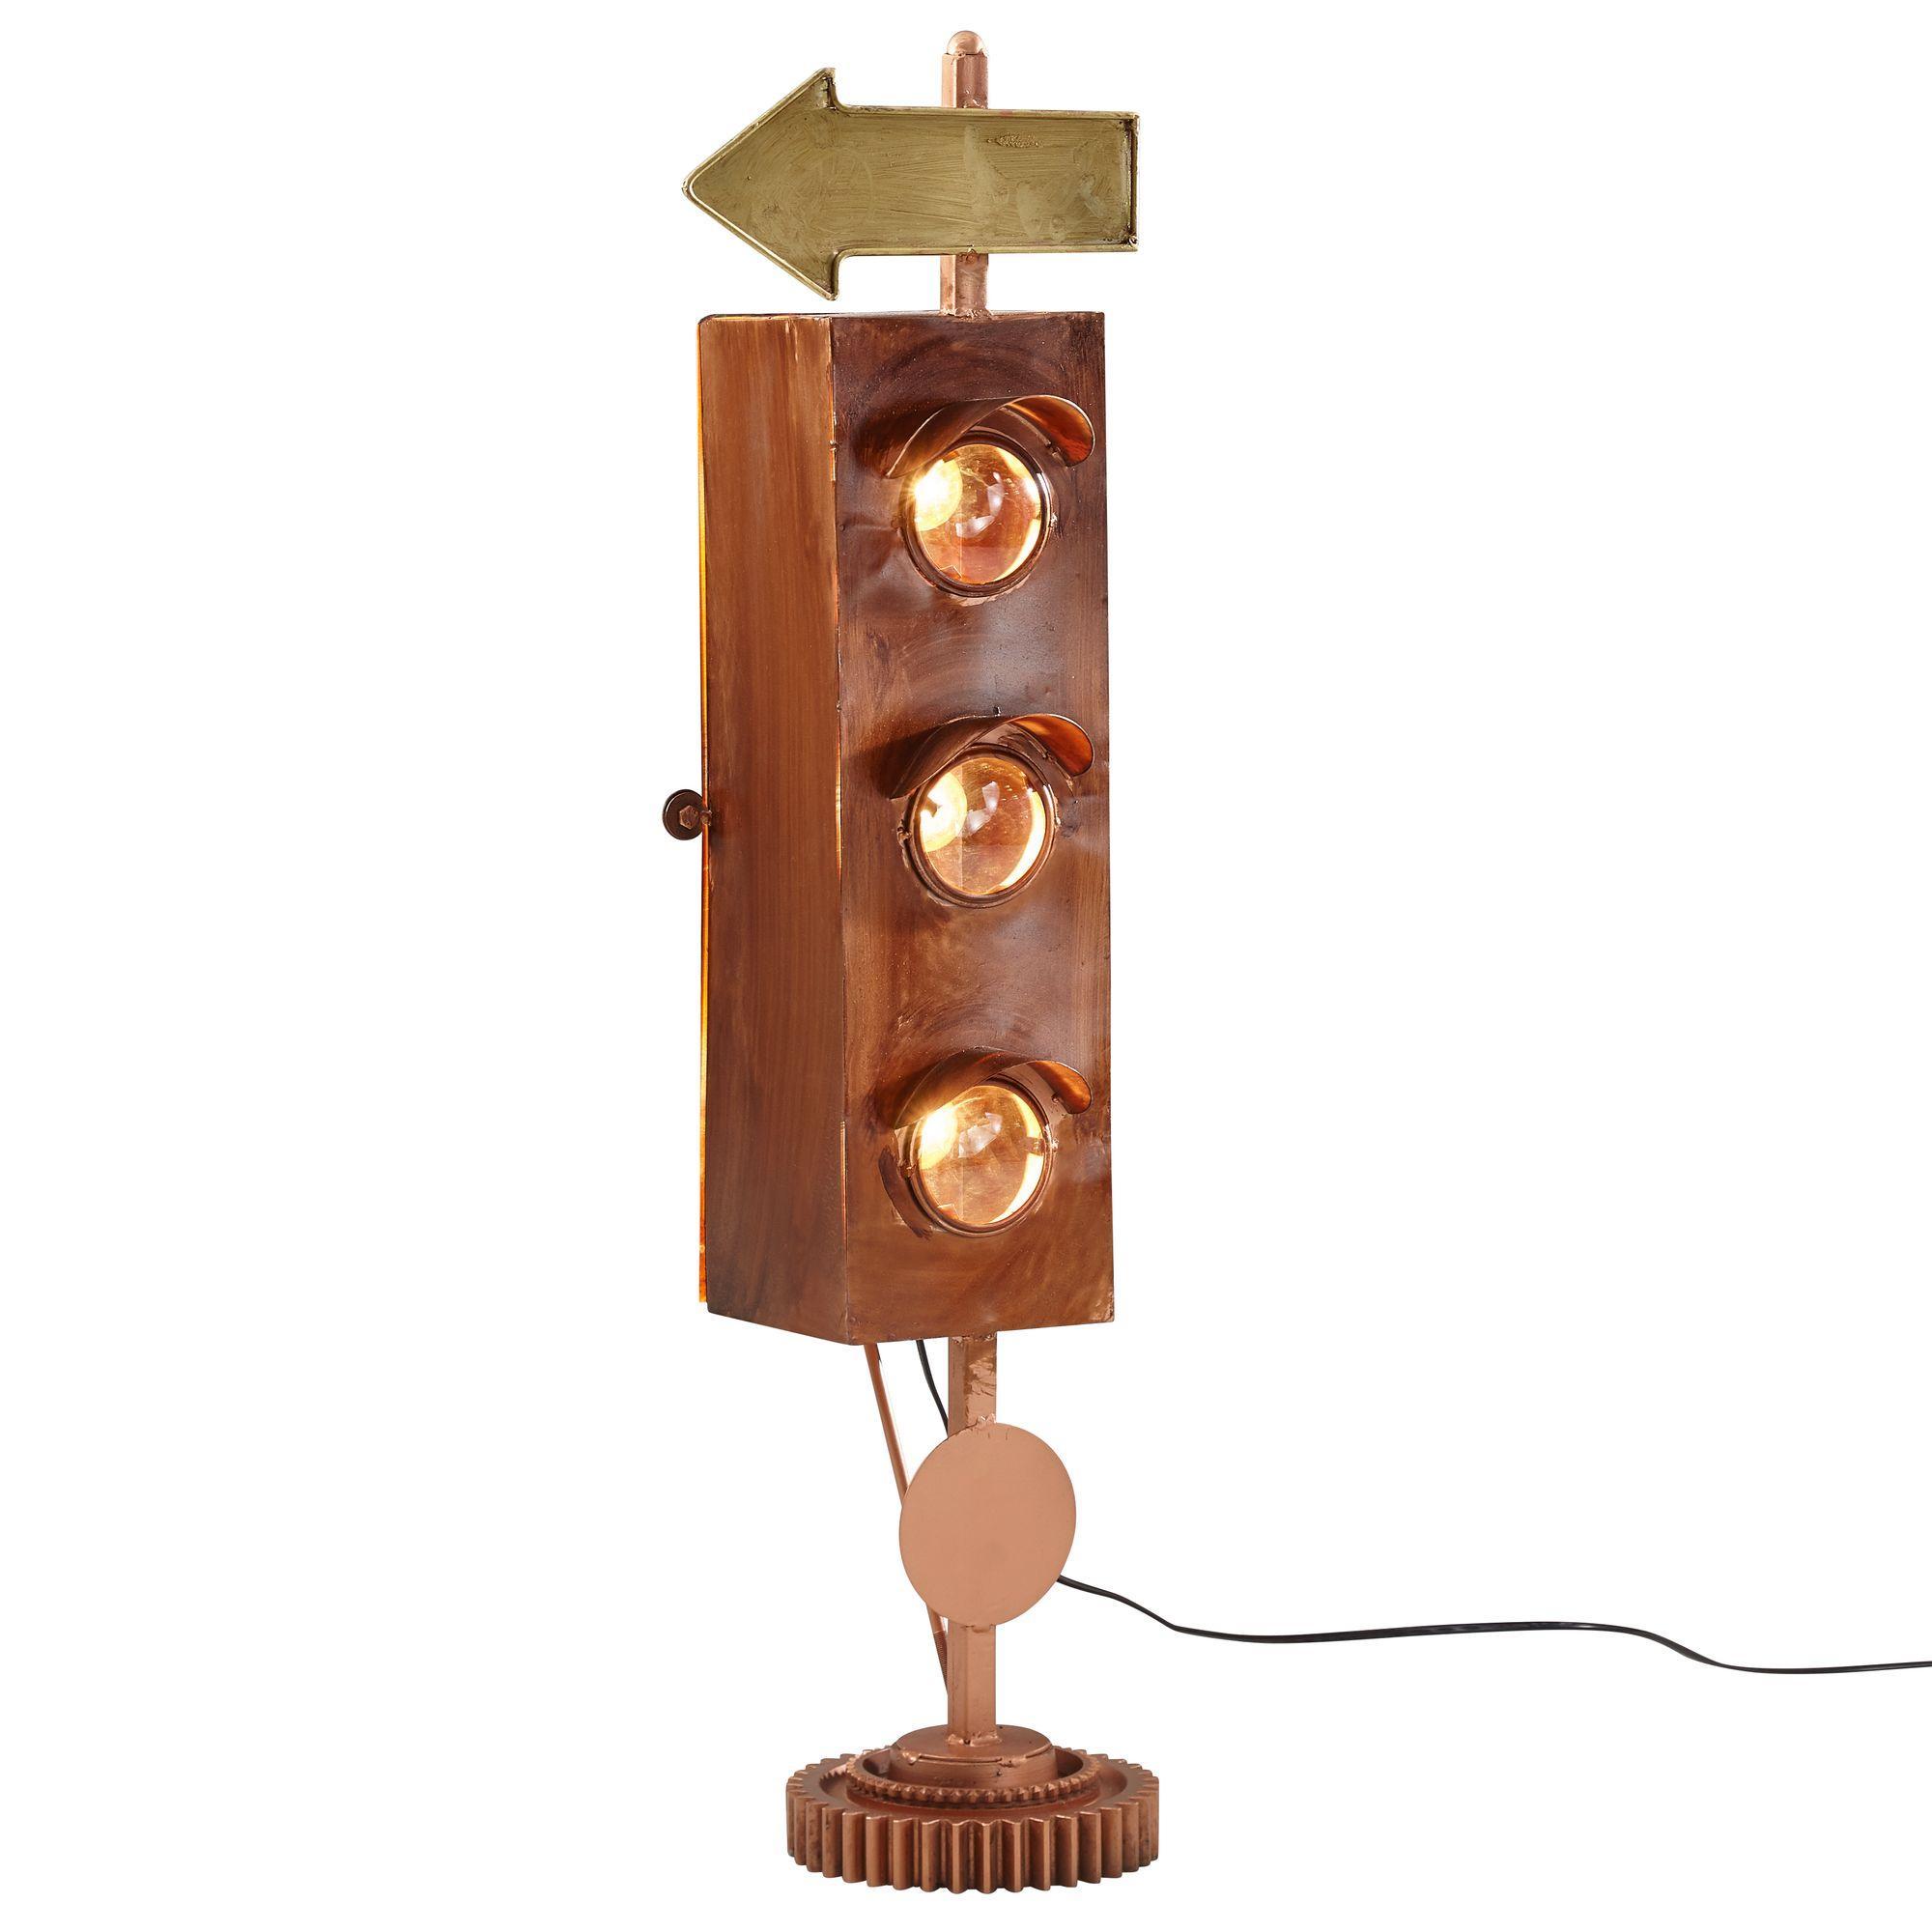 Stehlampe Vintage Retro